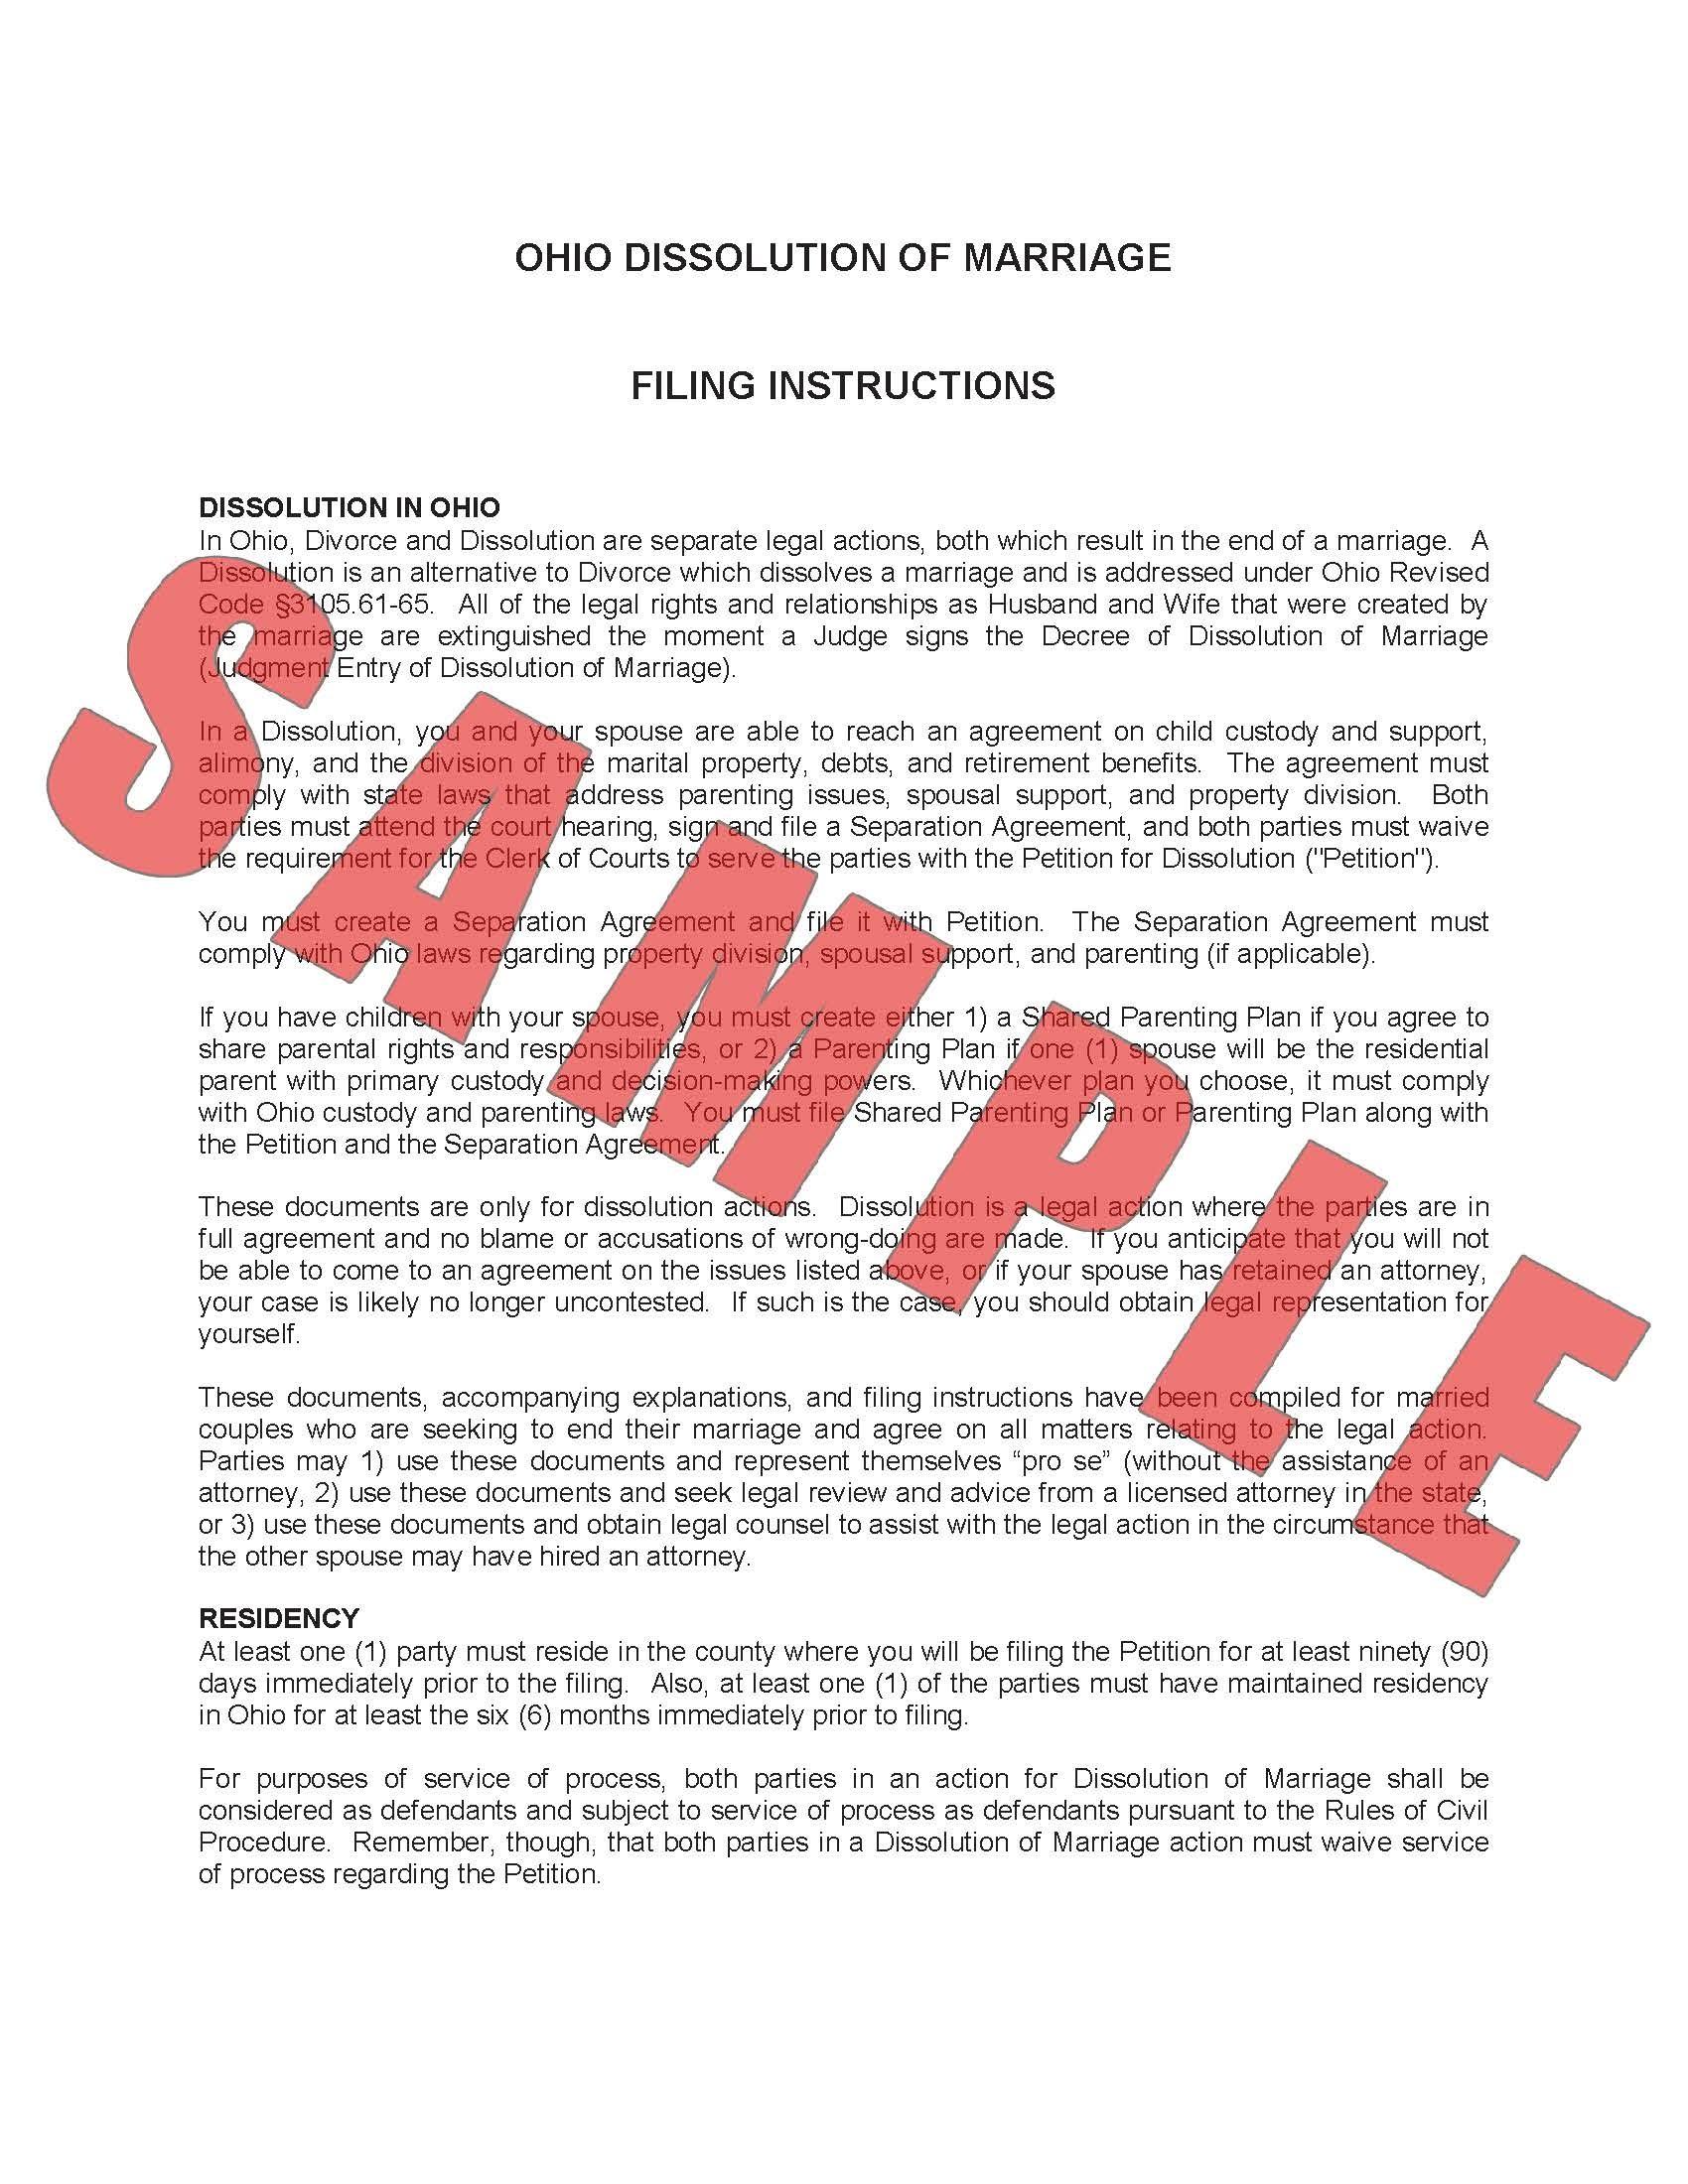 Child Custody Forms Franklin County Ohio